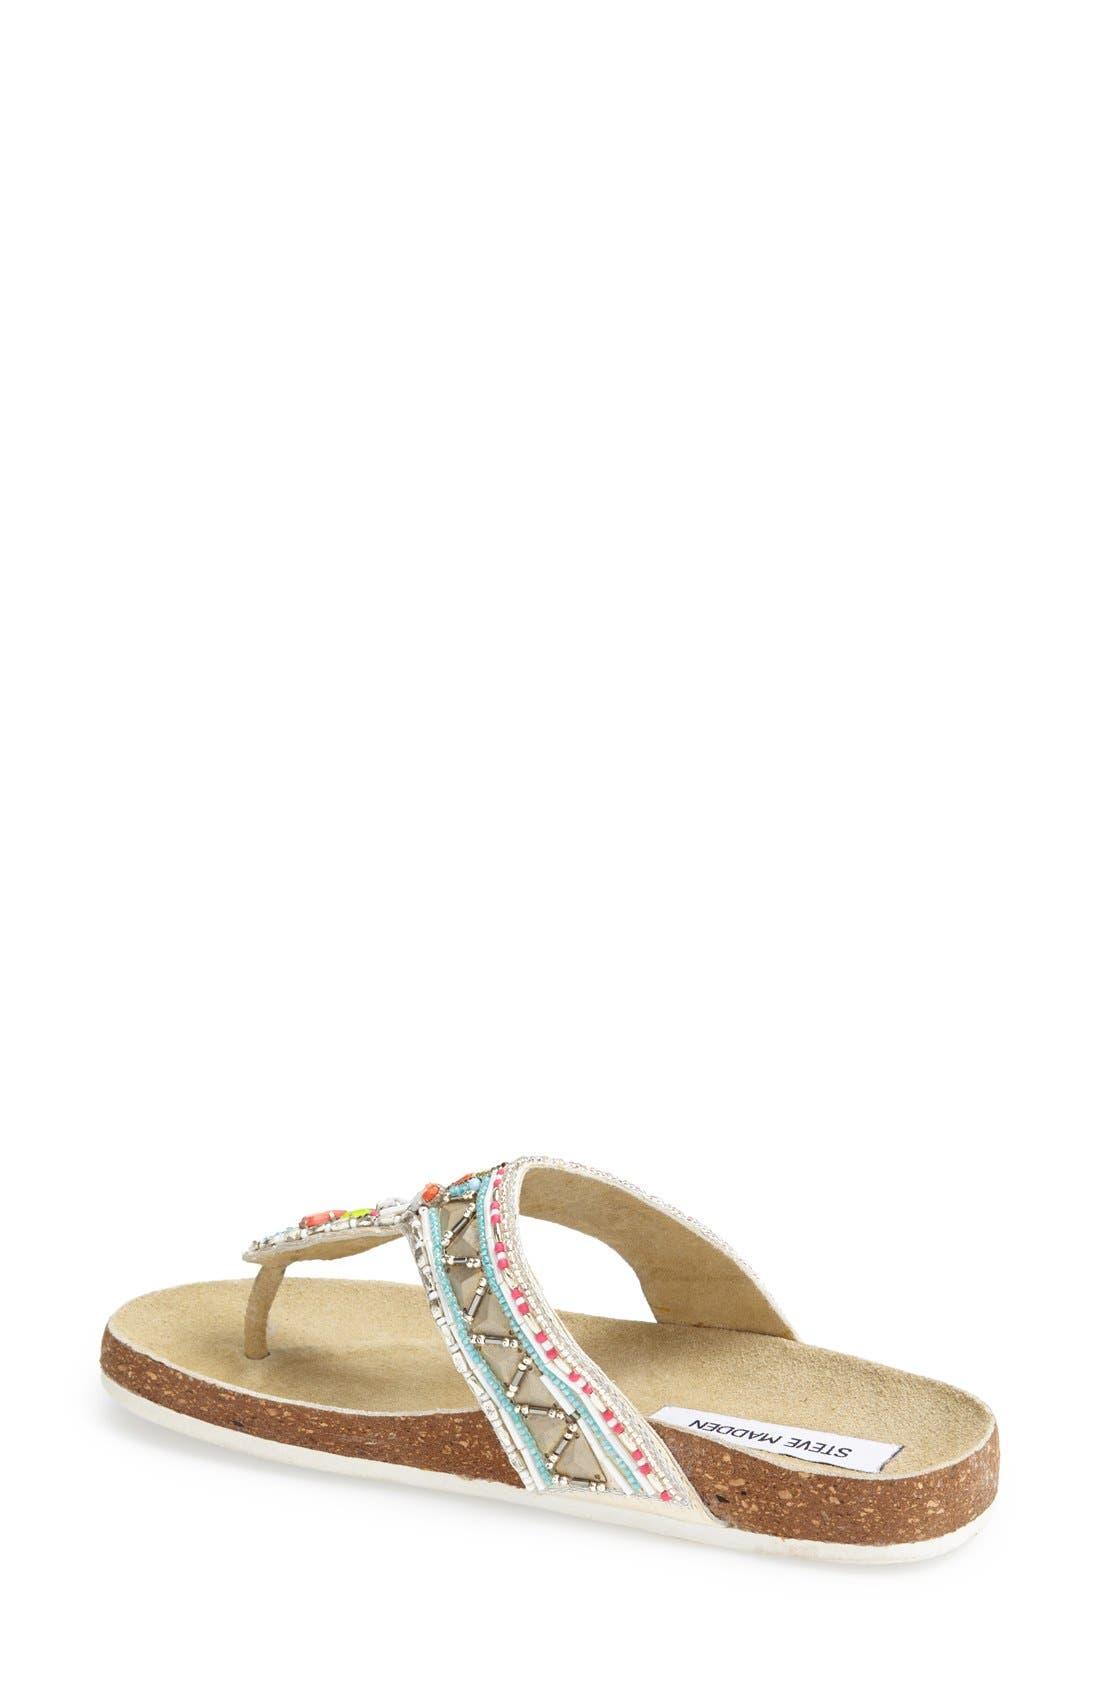 Alternate Image 2  - Steve Madden 'Fiessta' Embellished Thong Sandal (Women)